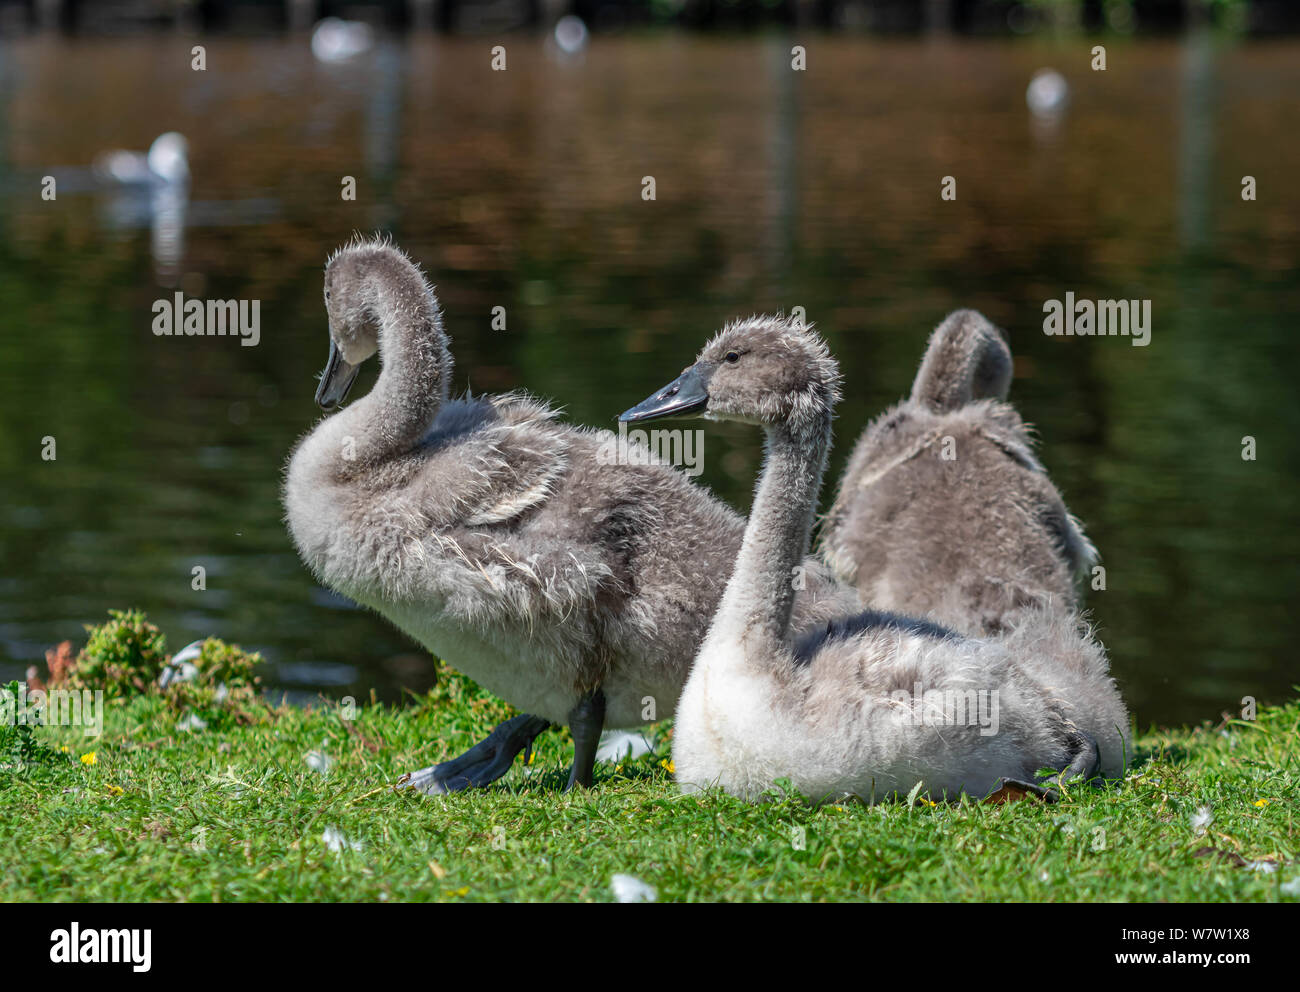 three cute baby swan, bird portrait Stock Photo